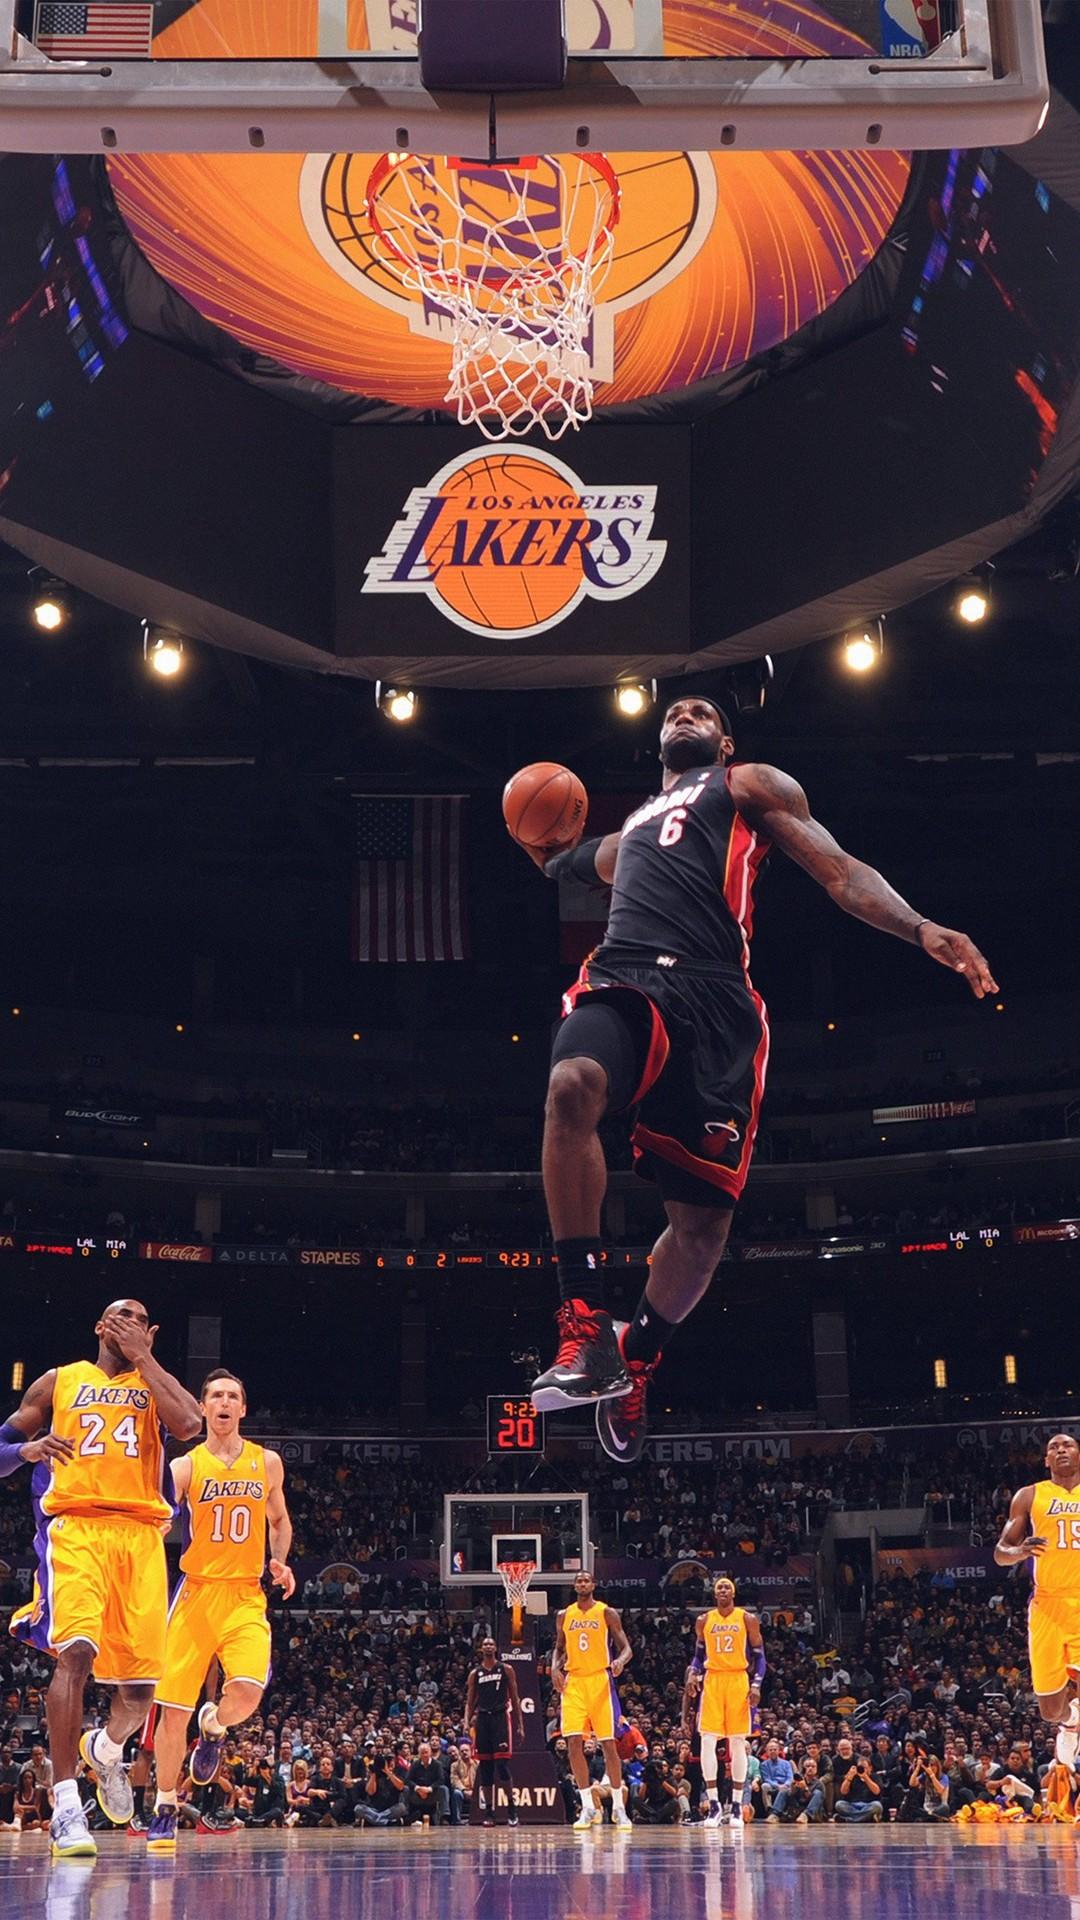 LeBron James 23 Wallpaper – Cleveland Cavaliers Wallpaper   Download  Wallpaper   Pinterest   Wallpaper